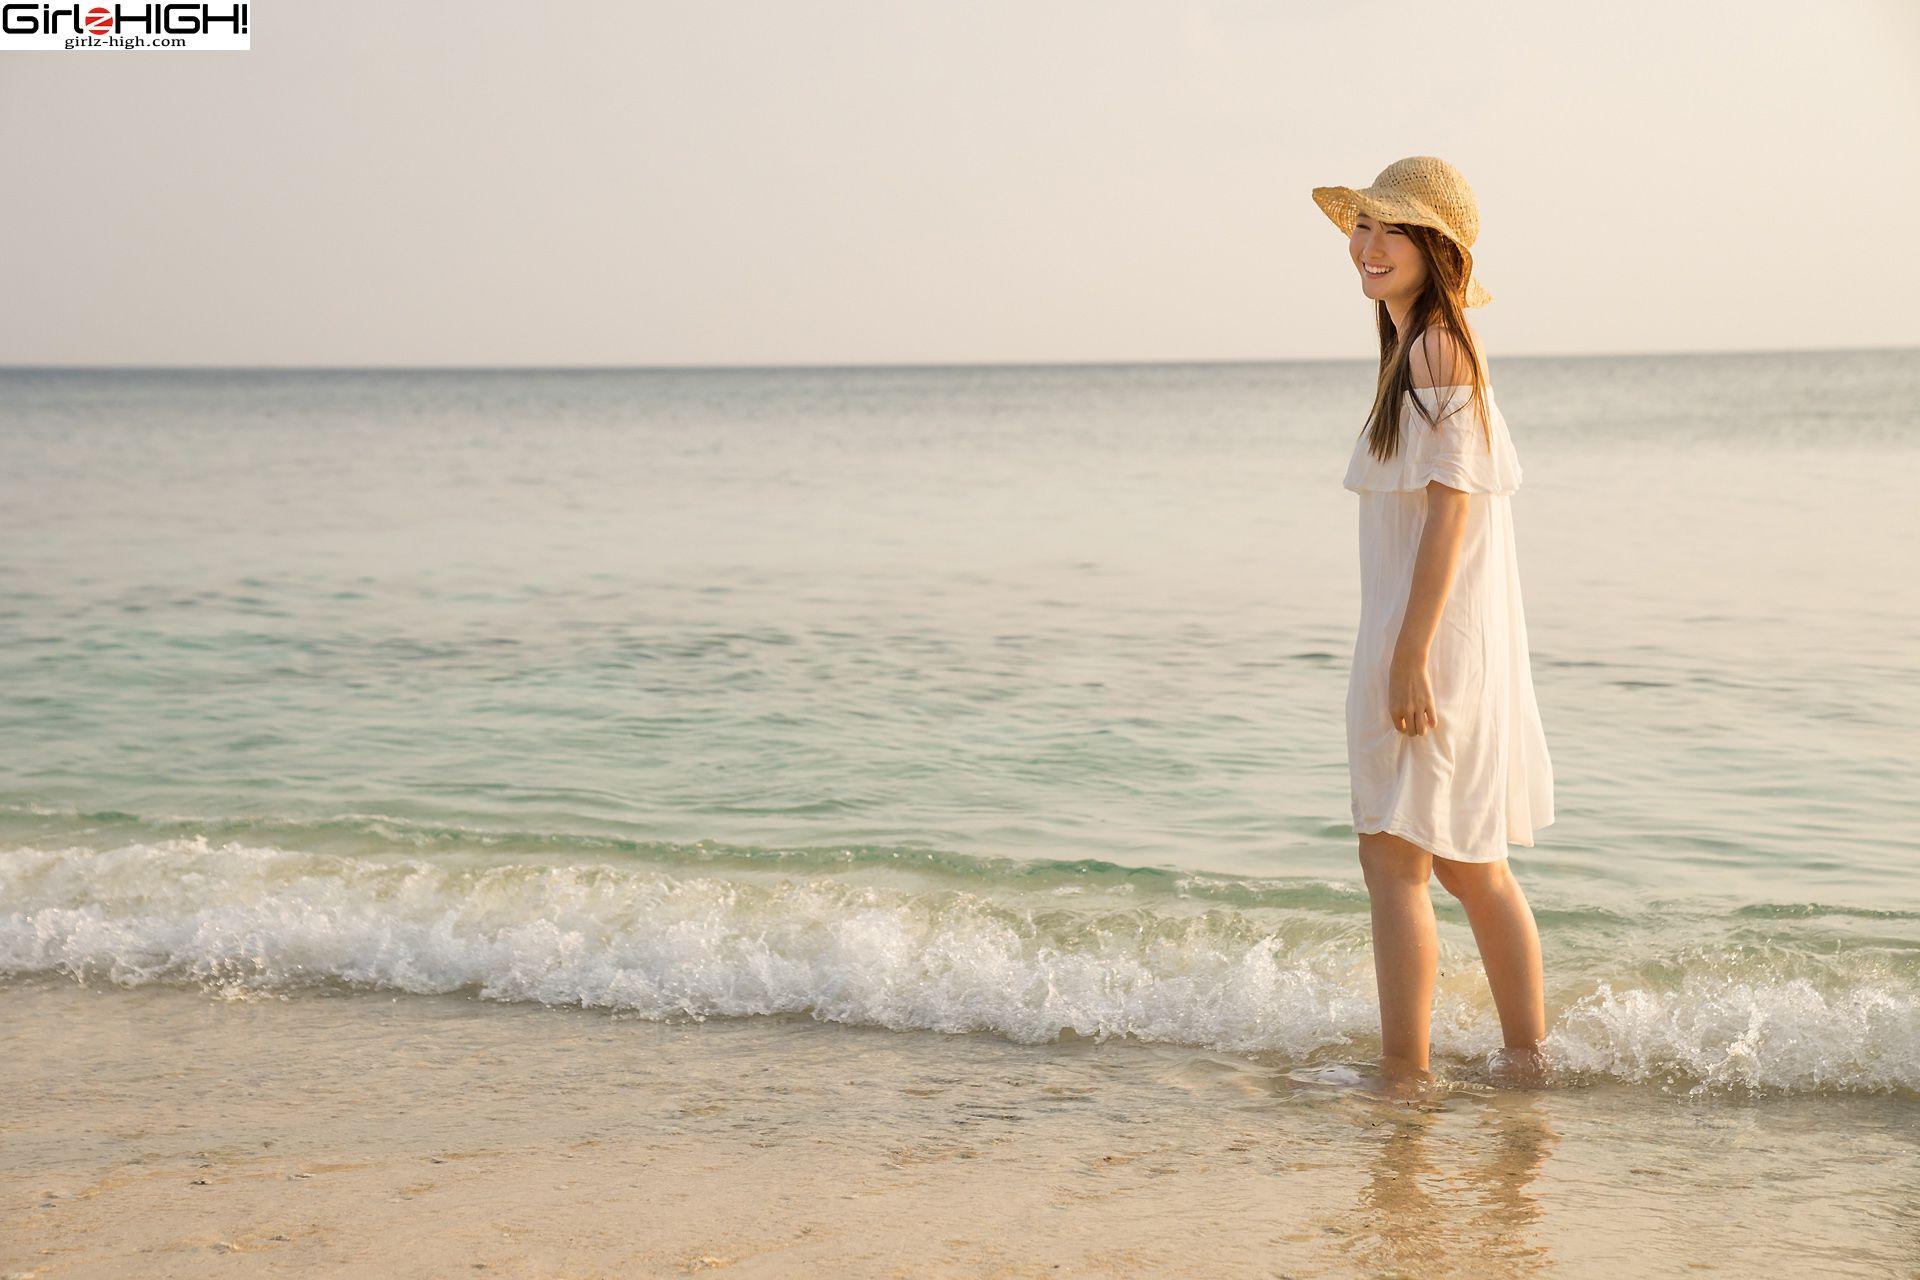 VOL.787 [Girlz-High]阳光海边美女:近藤麻美(近藤あさみ)超高清写真套图(42P)